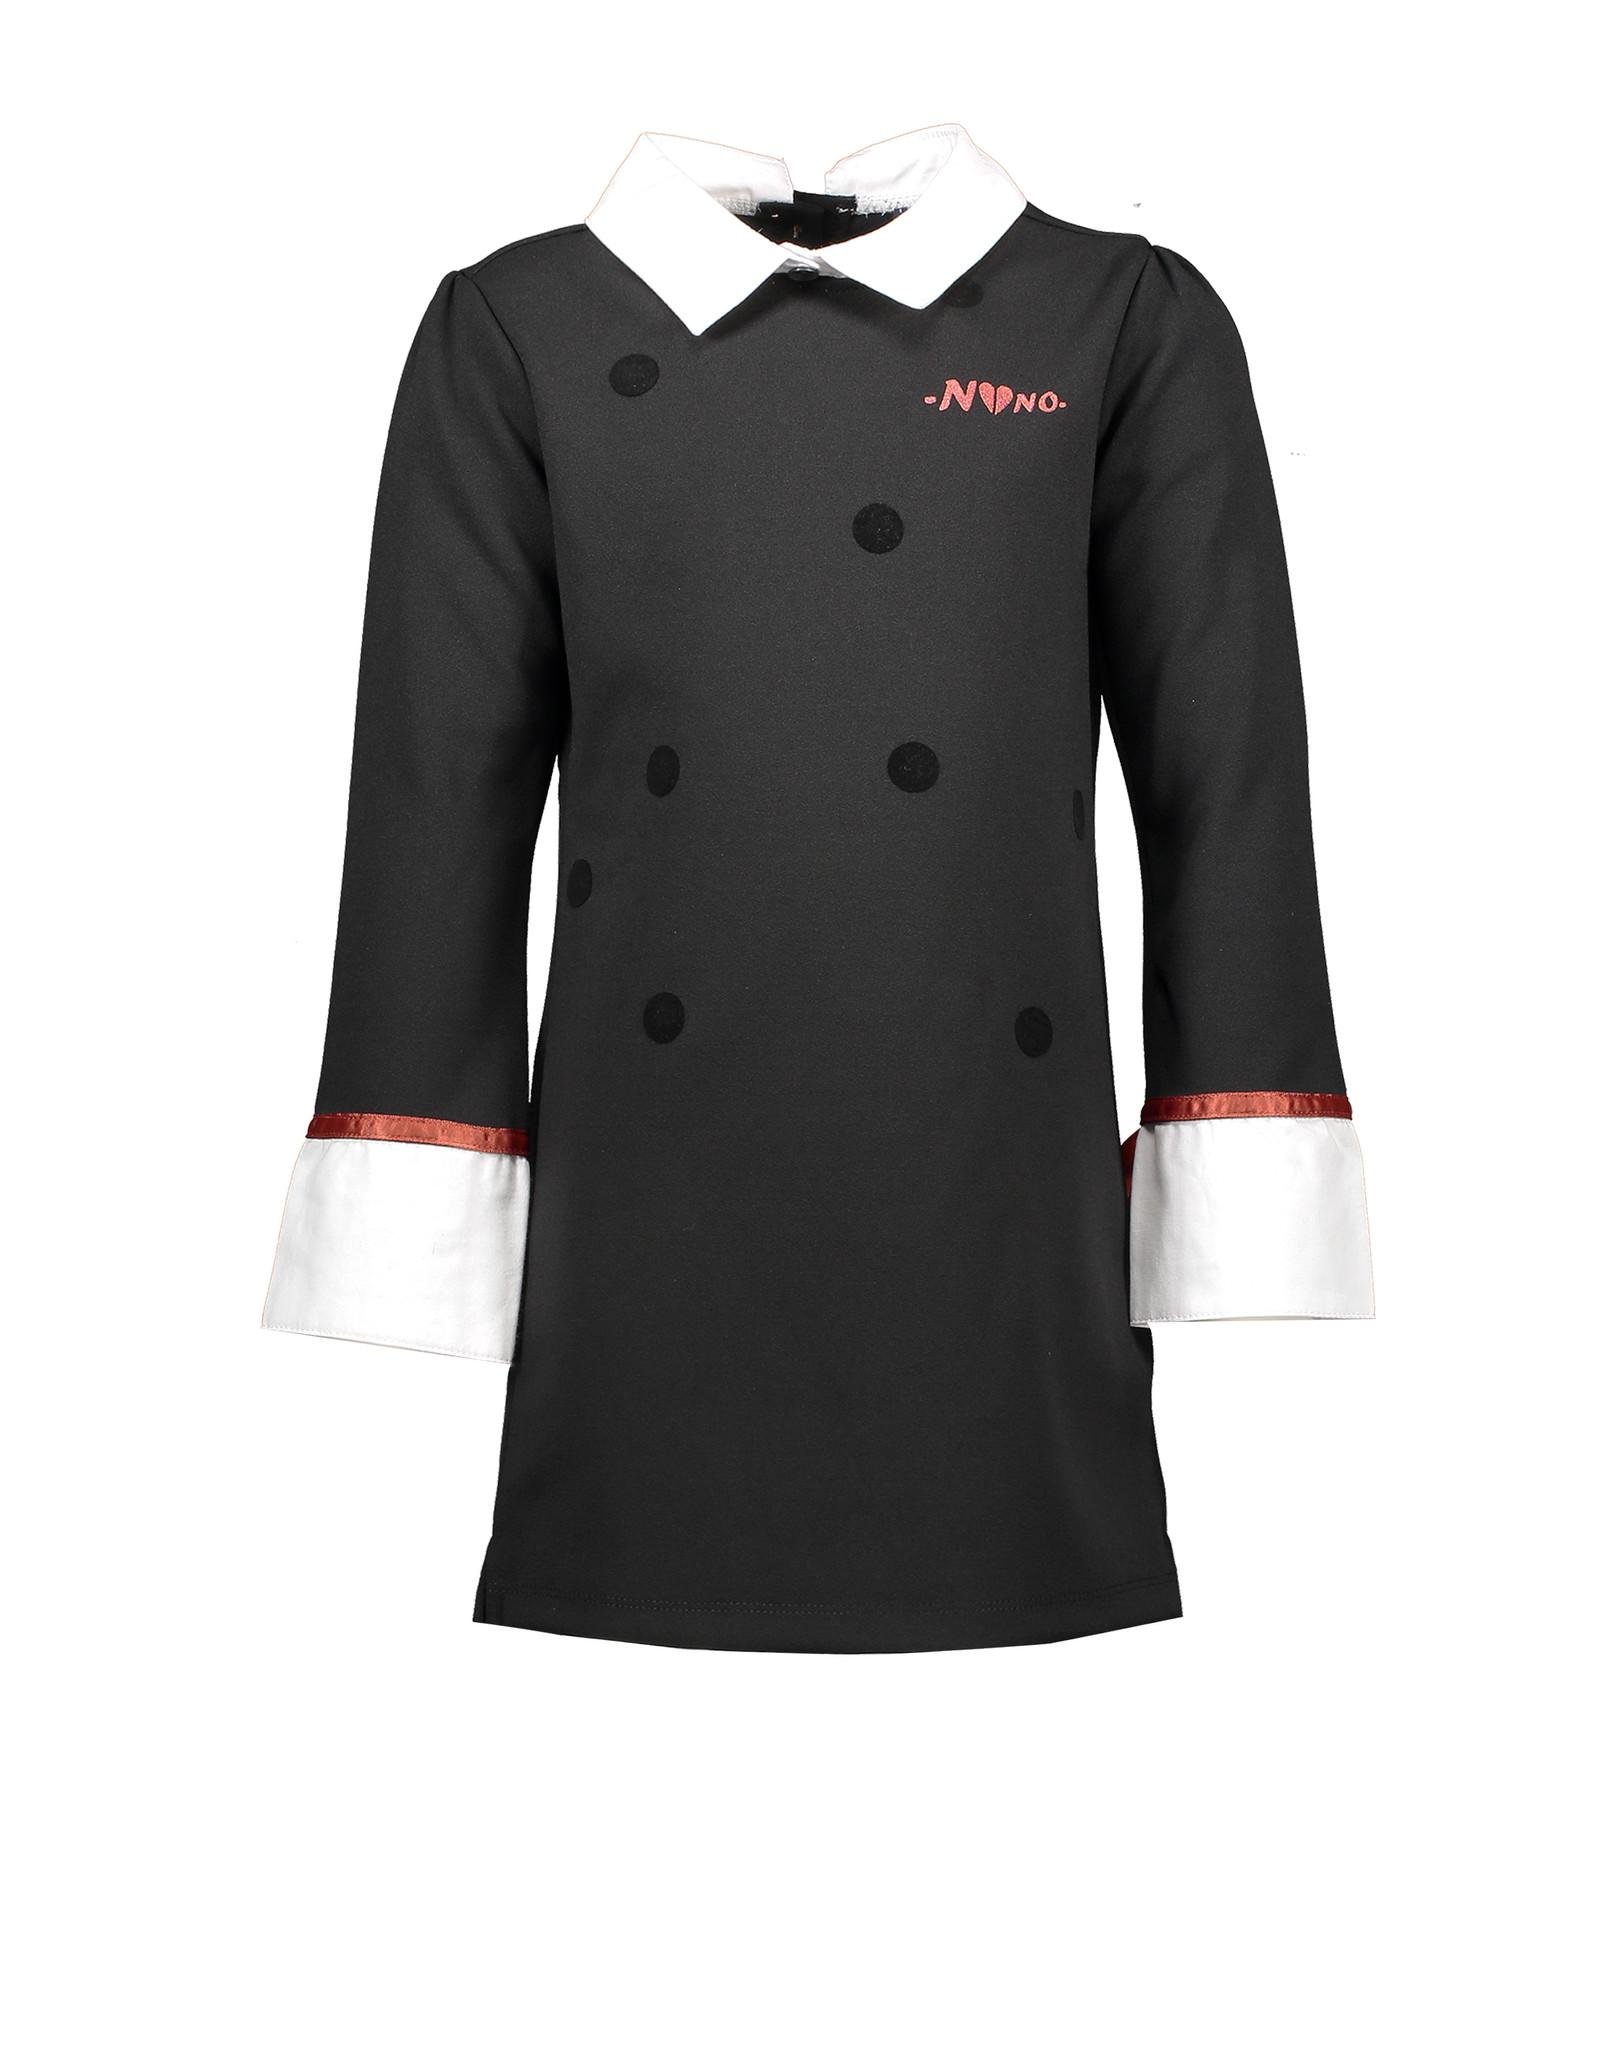 NONO NONO Marlijn little black dress with fancy collar and cuffs Jet Black